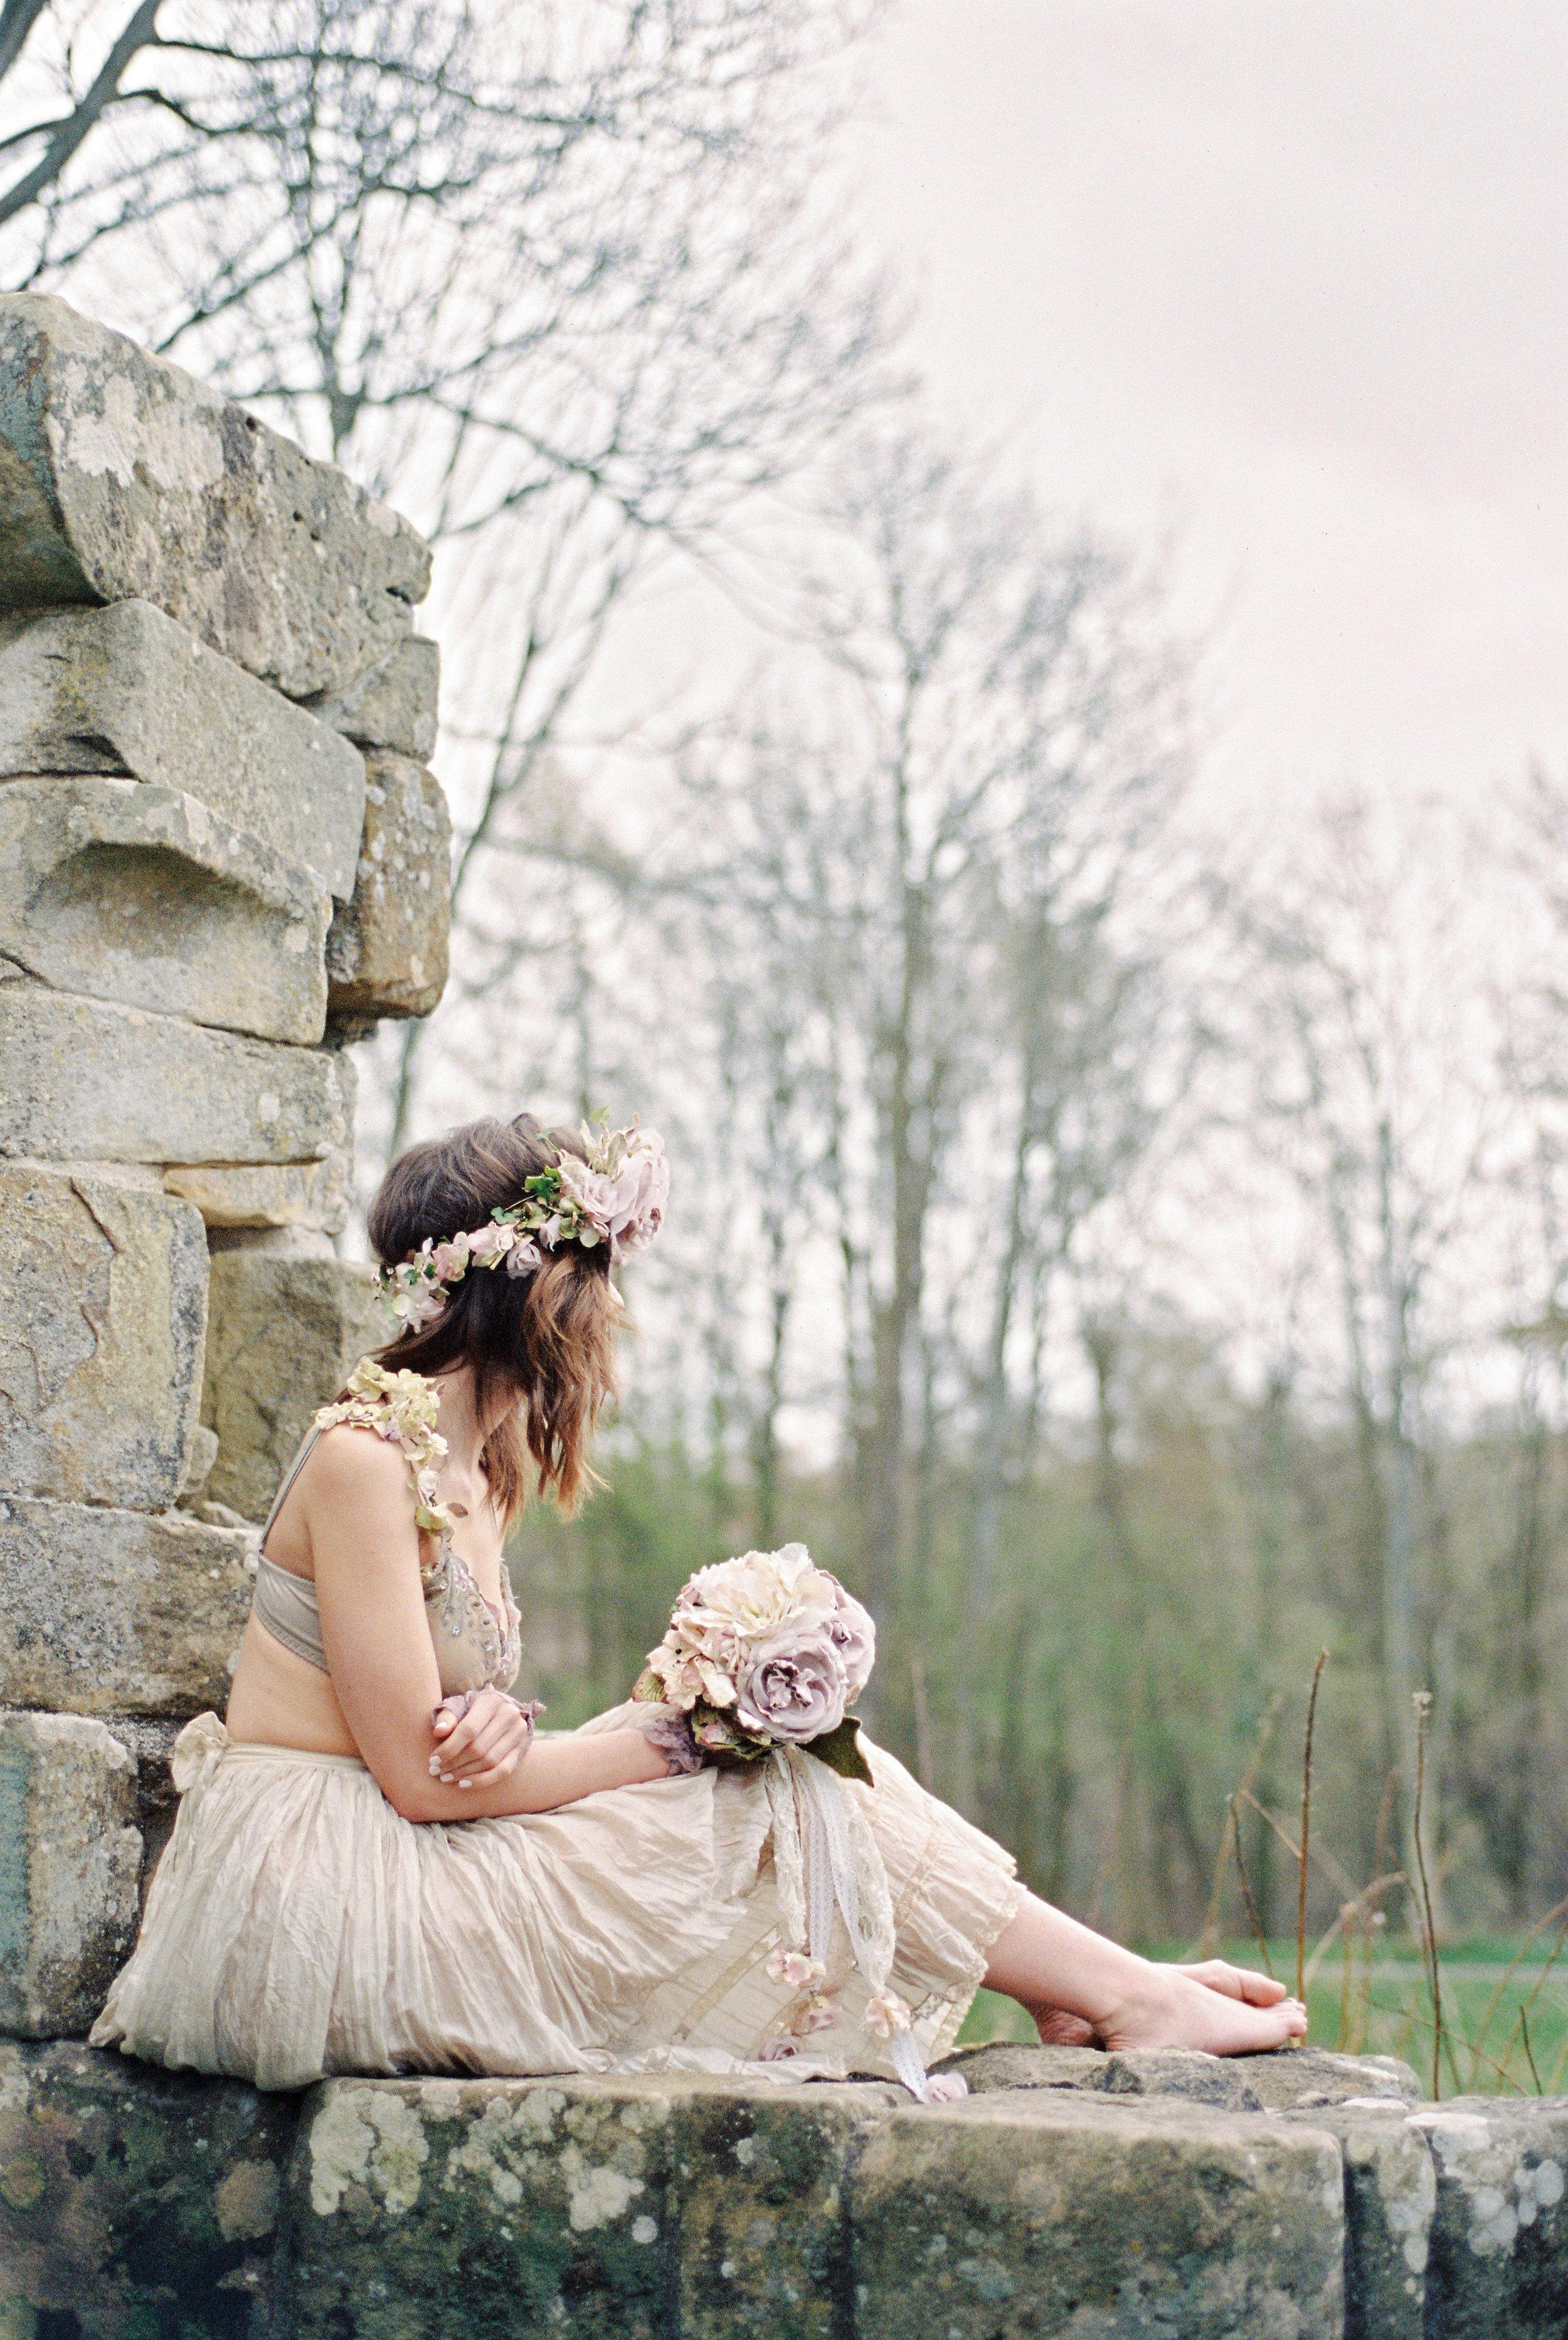 GeorginaHarrisonPhotography-114.jpg